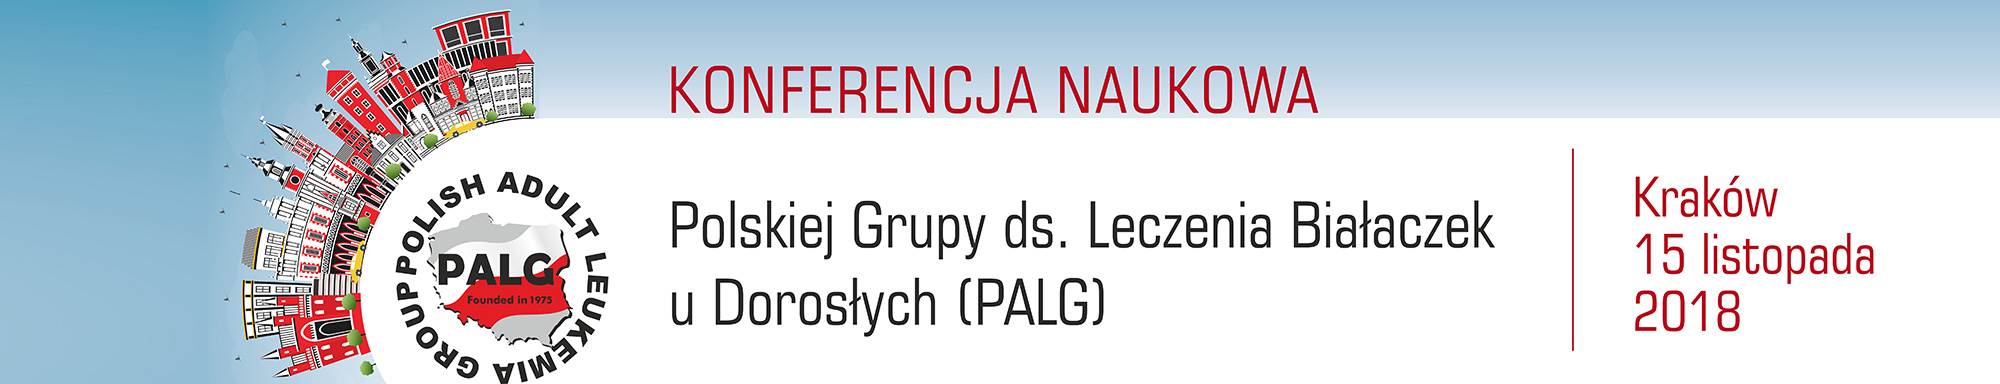 Konferencja PALG 2018